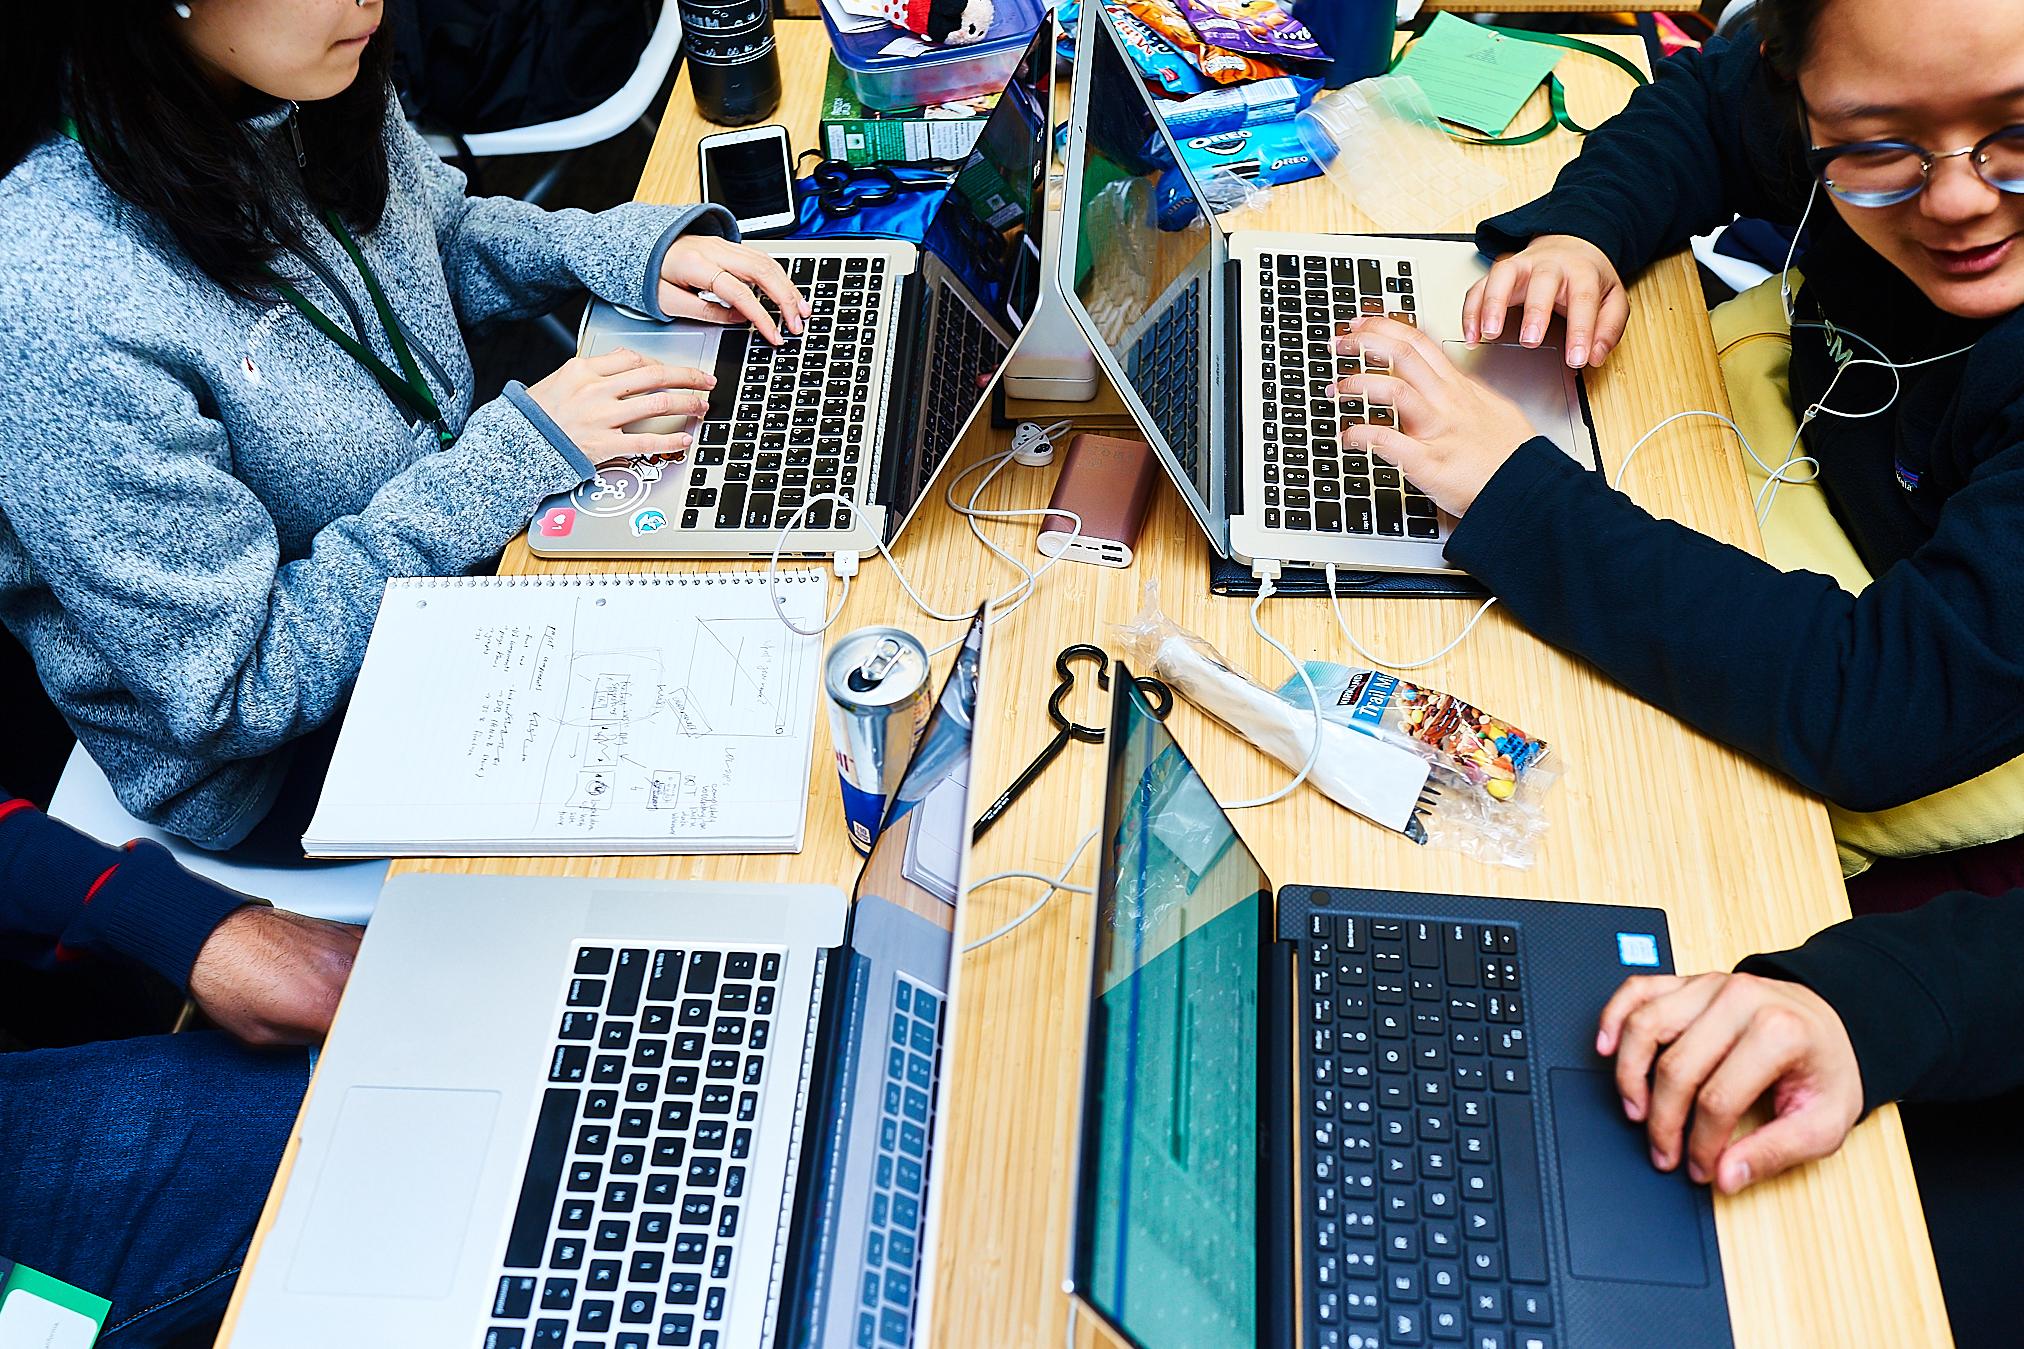 Student Hackers